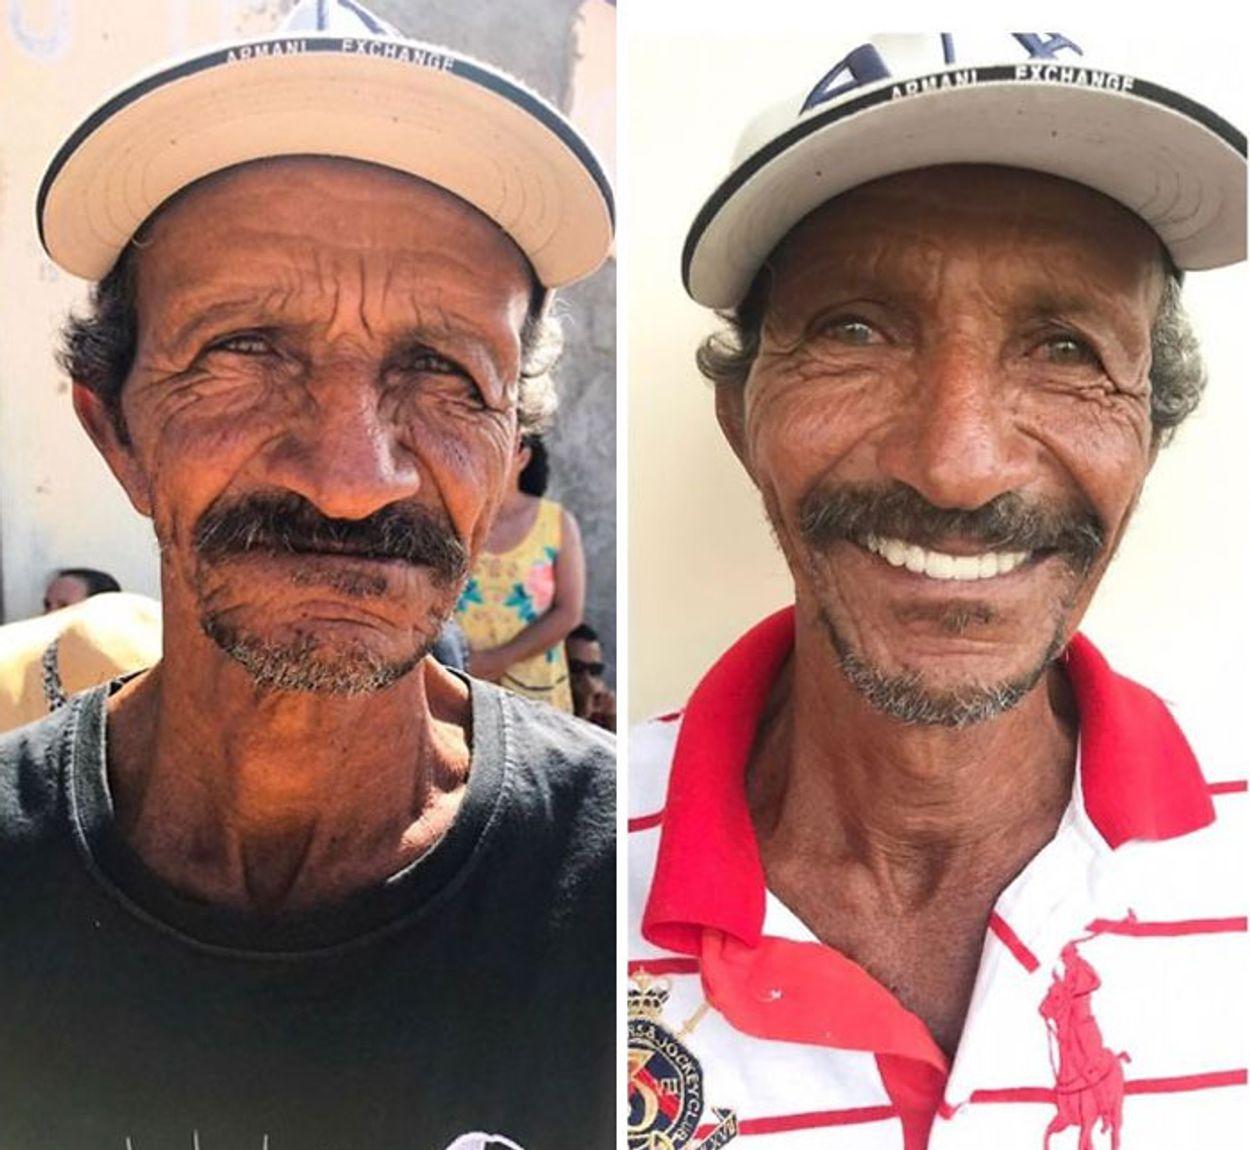 brazilian-dentist-travel-poor-people-teeth-fix-felipe-rossi-41-5db953ca47896__700